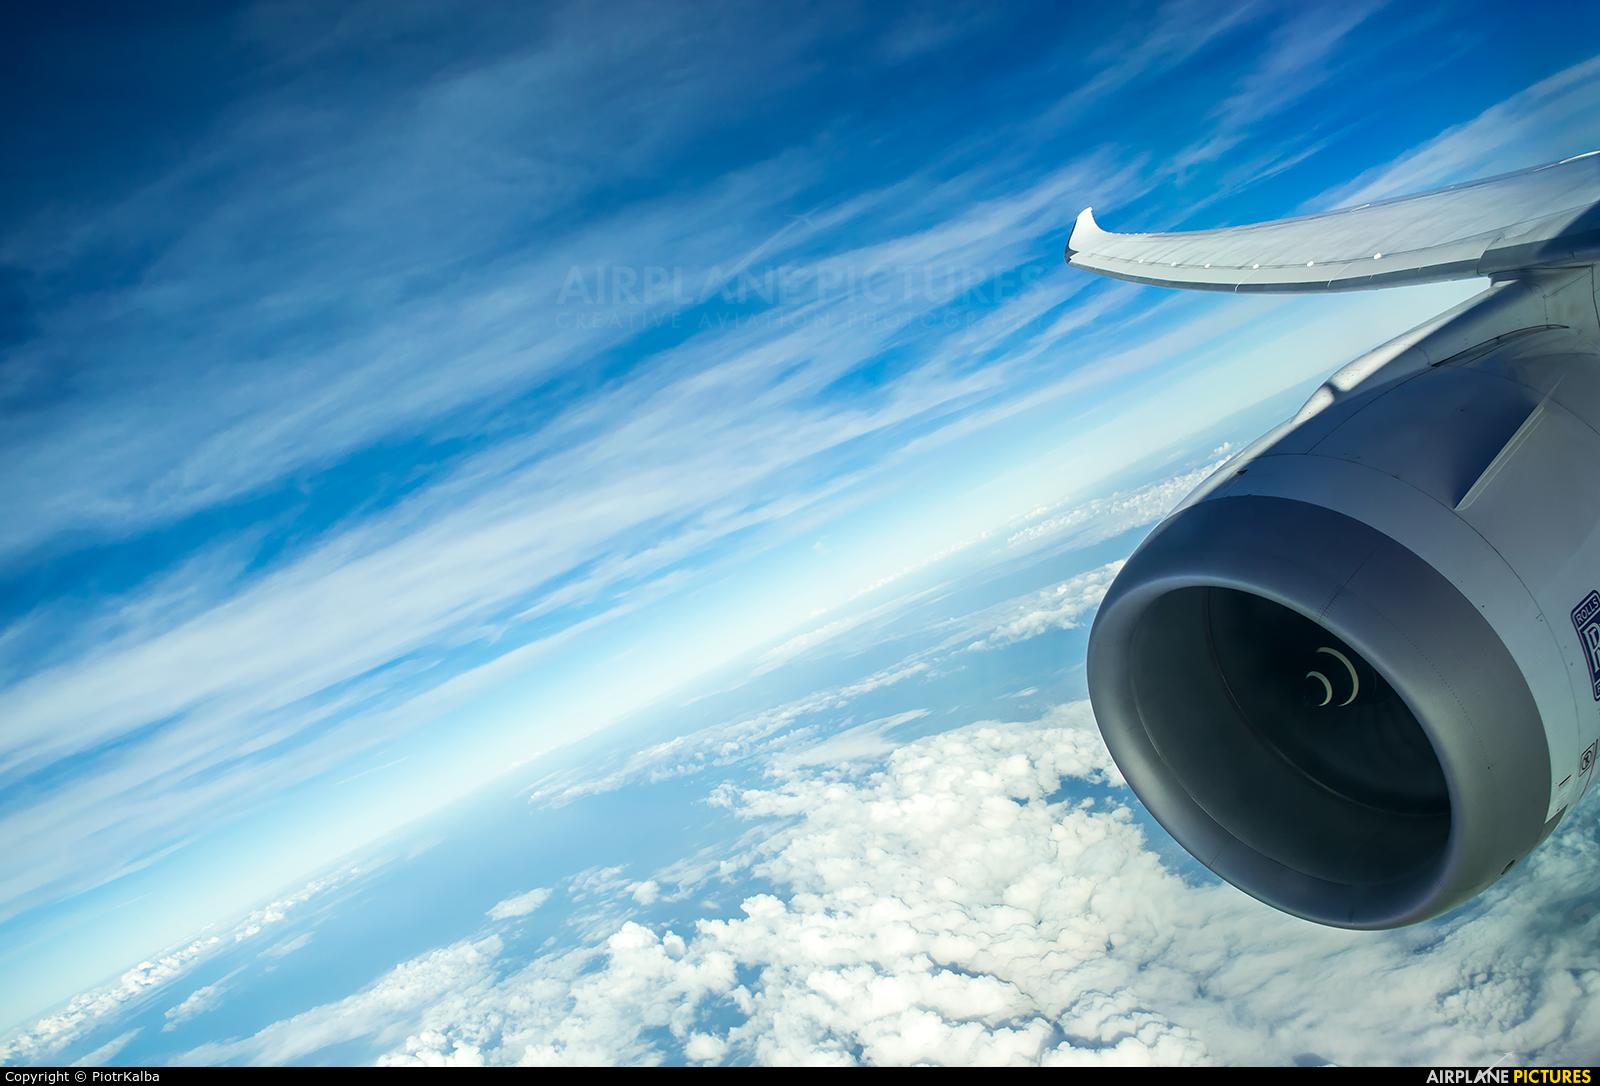 LOT - Polish Airlines SP-LRD aircraft at In Flight - International